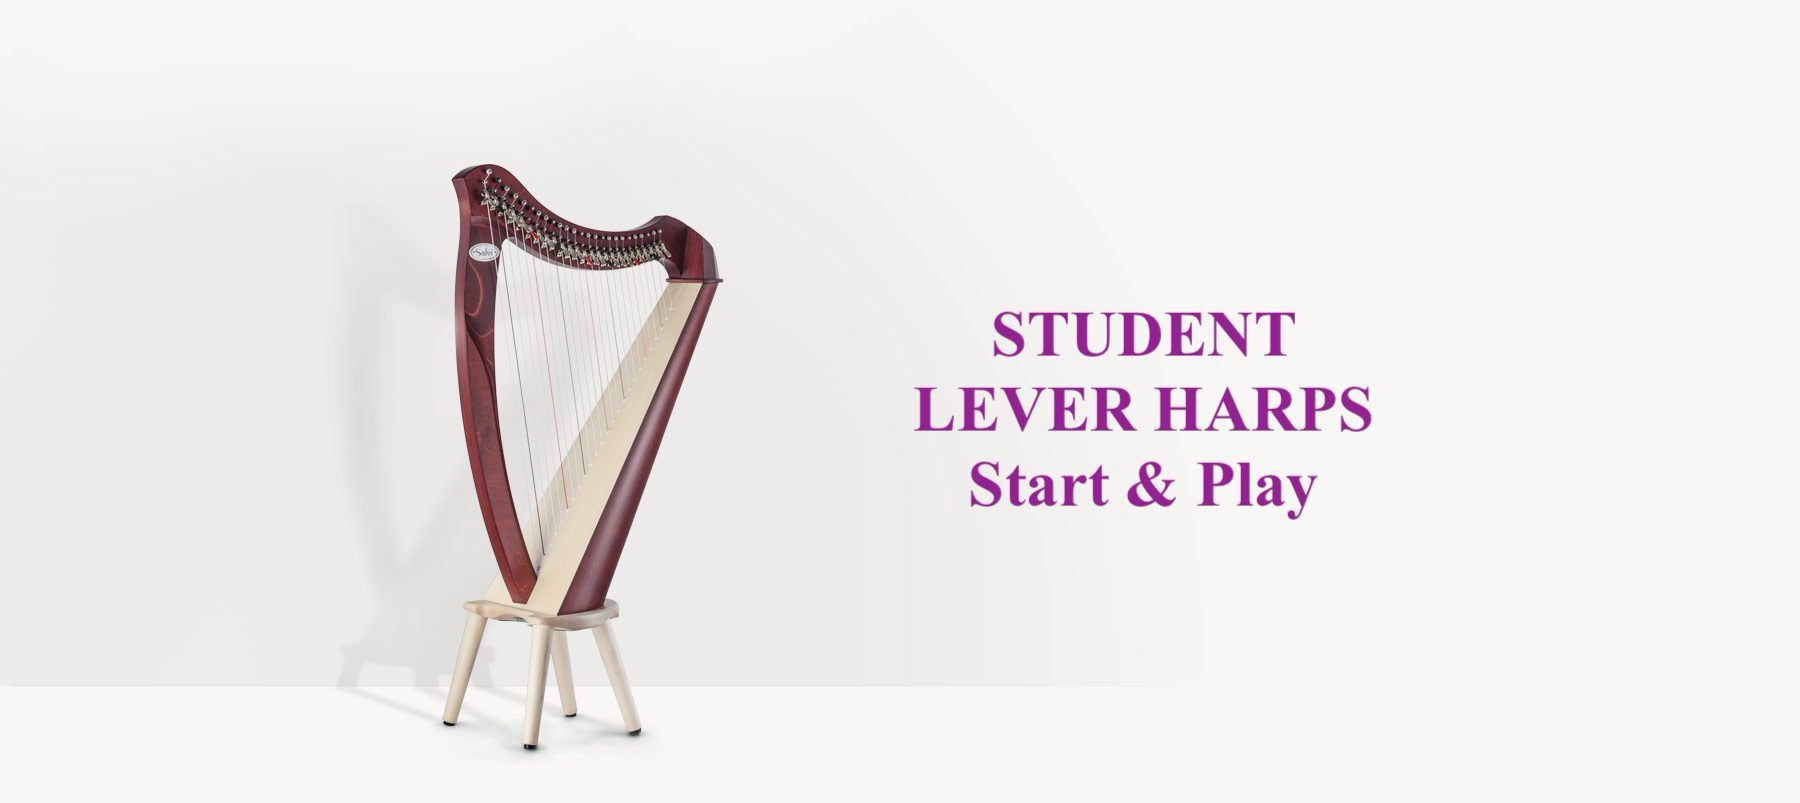 Start & Play